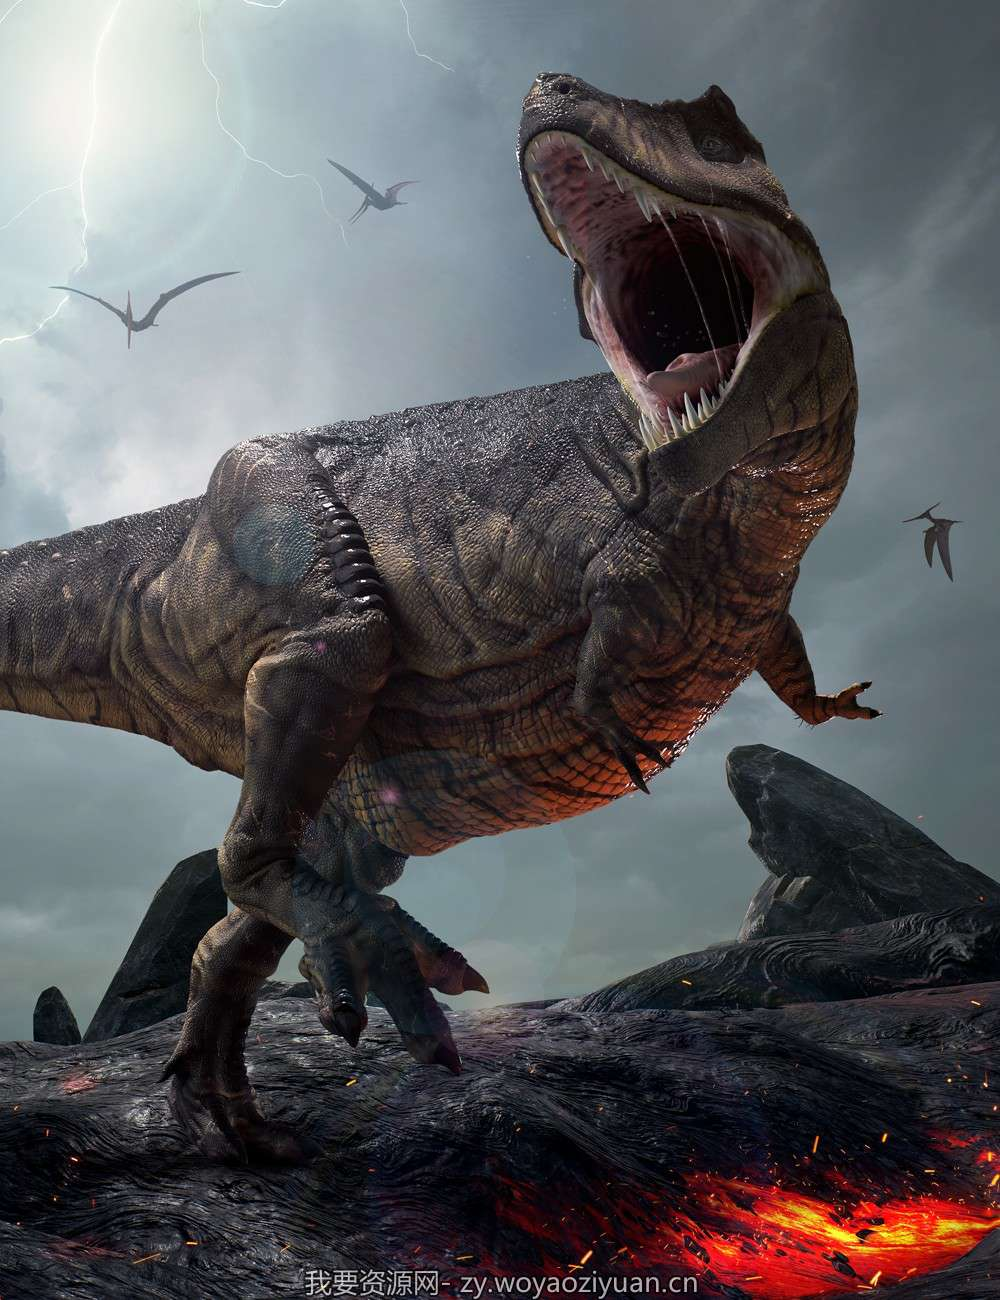 Tyrannosaurus Rex – Tyrant-Lizard King